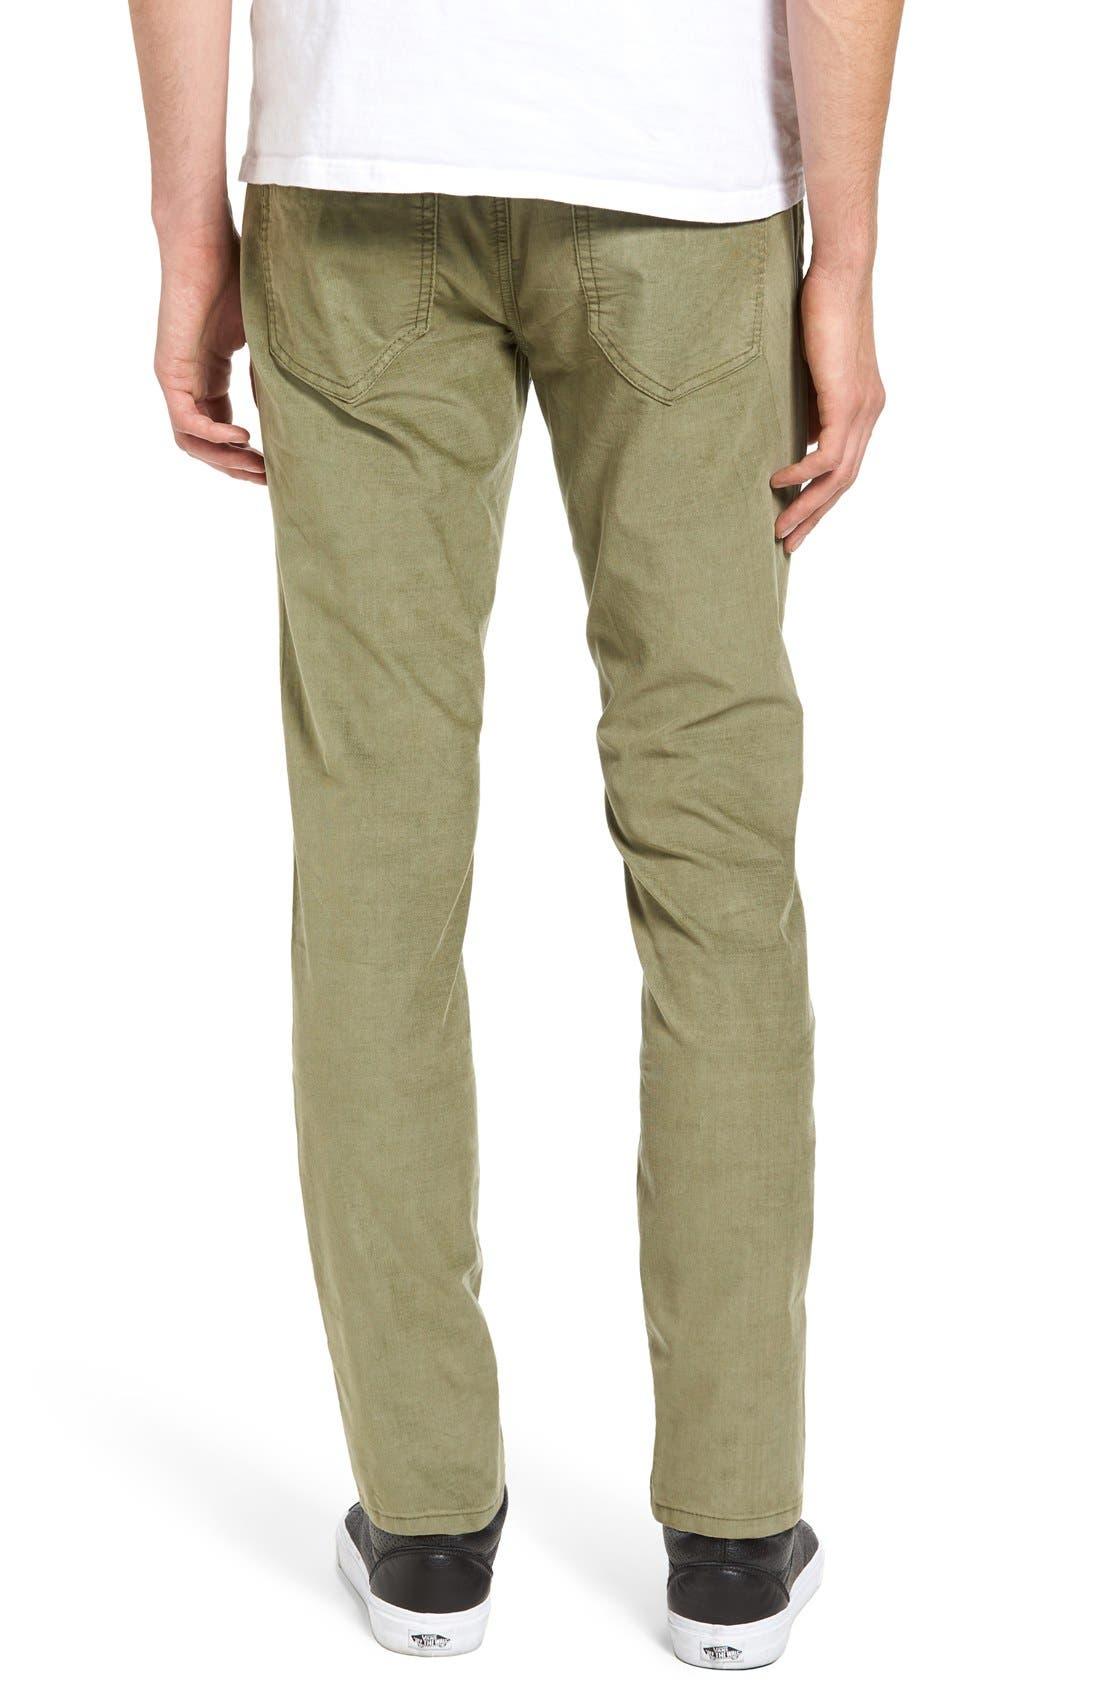 Bryce Chopper Slim Fit Corduroy Pants,                             Alternate thumbnail 7, color,                             302